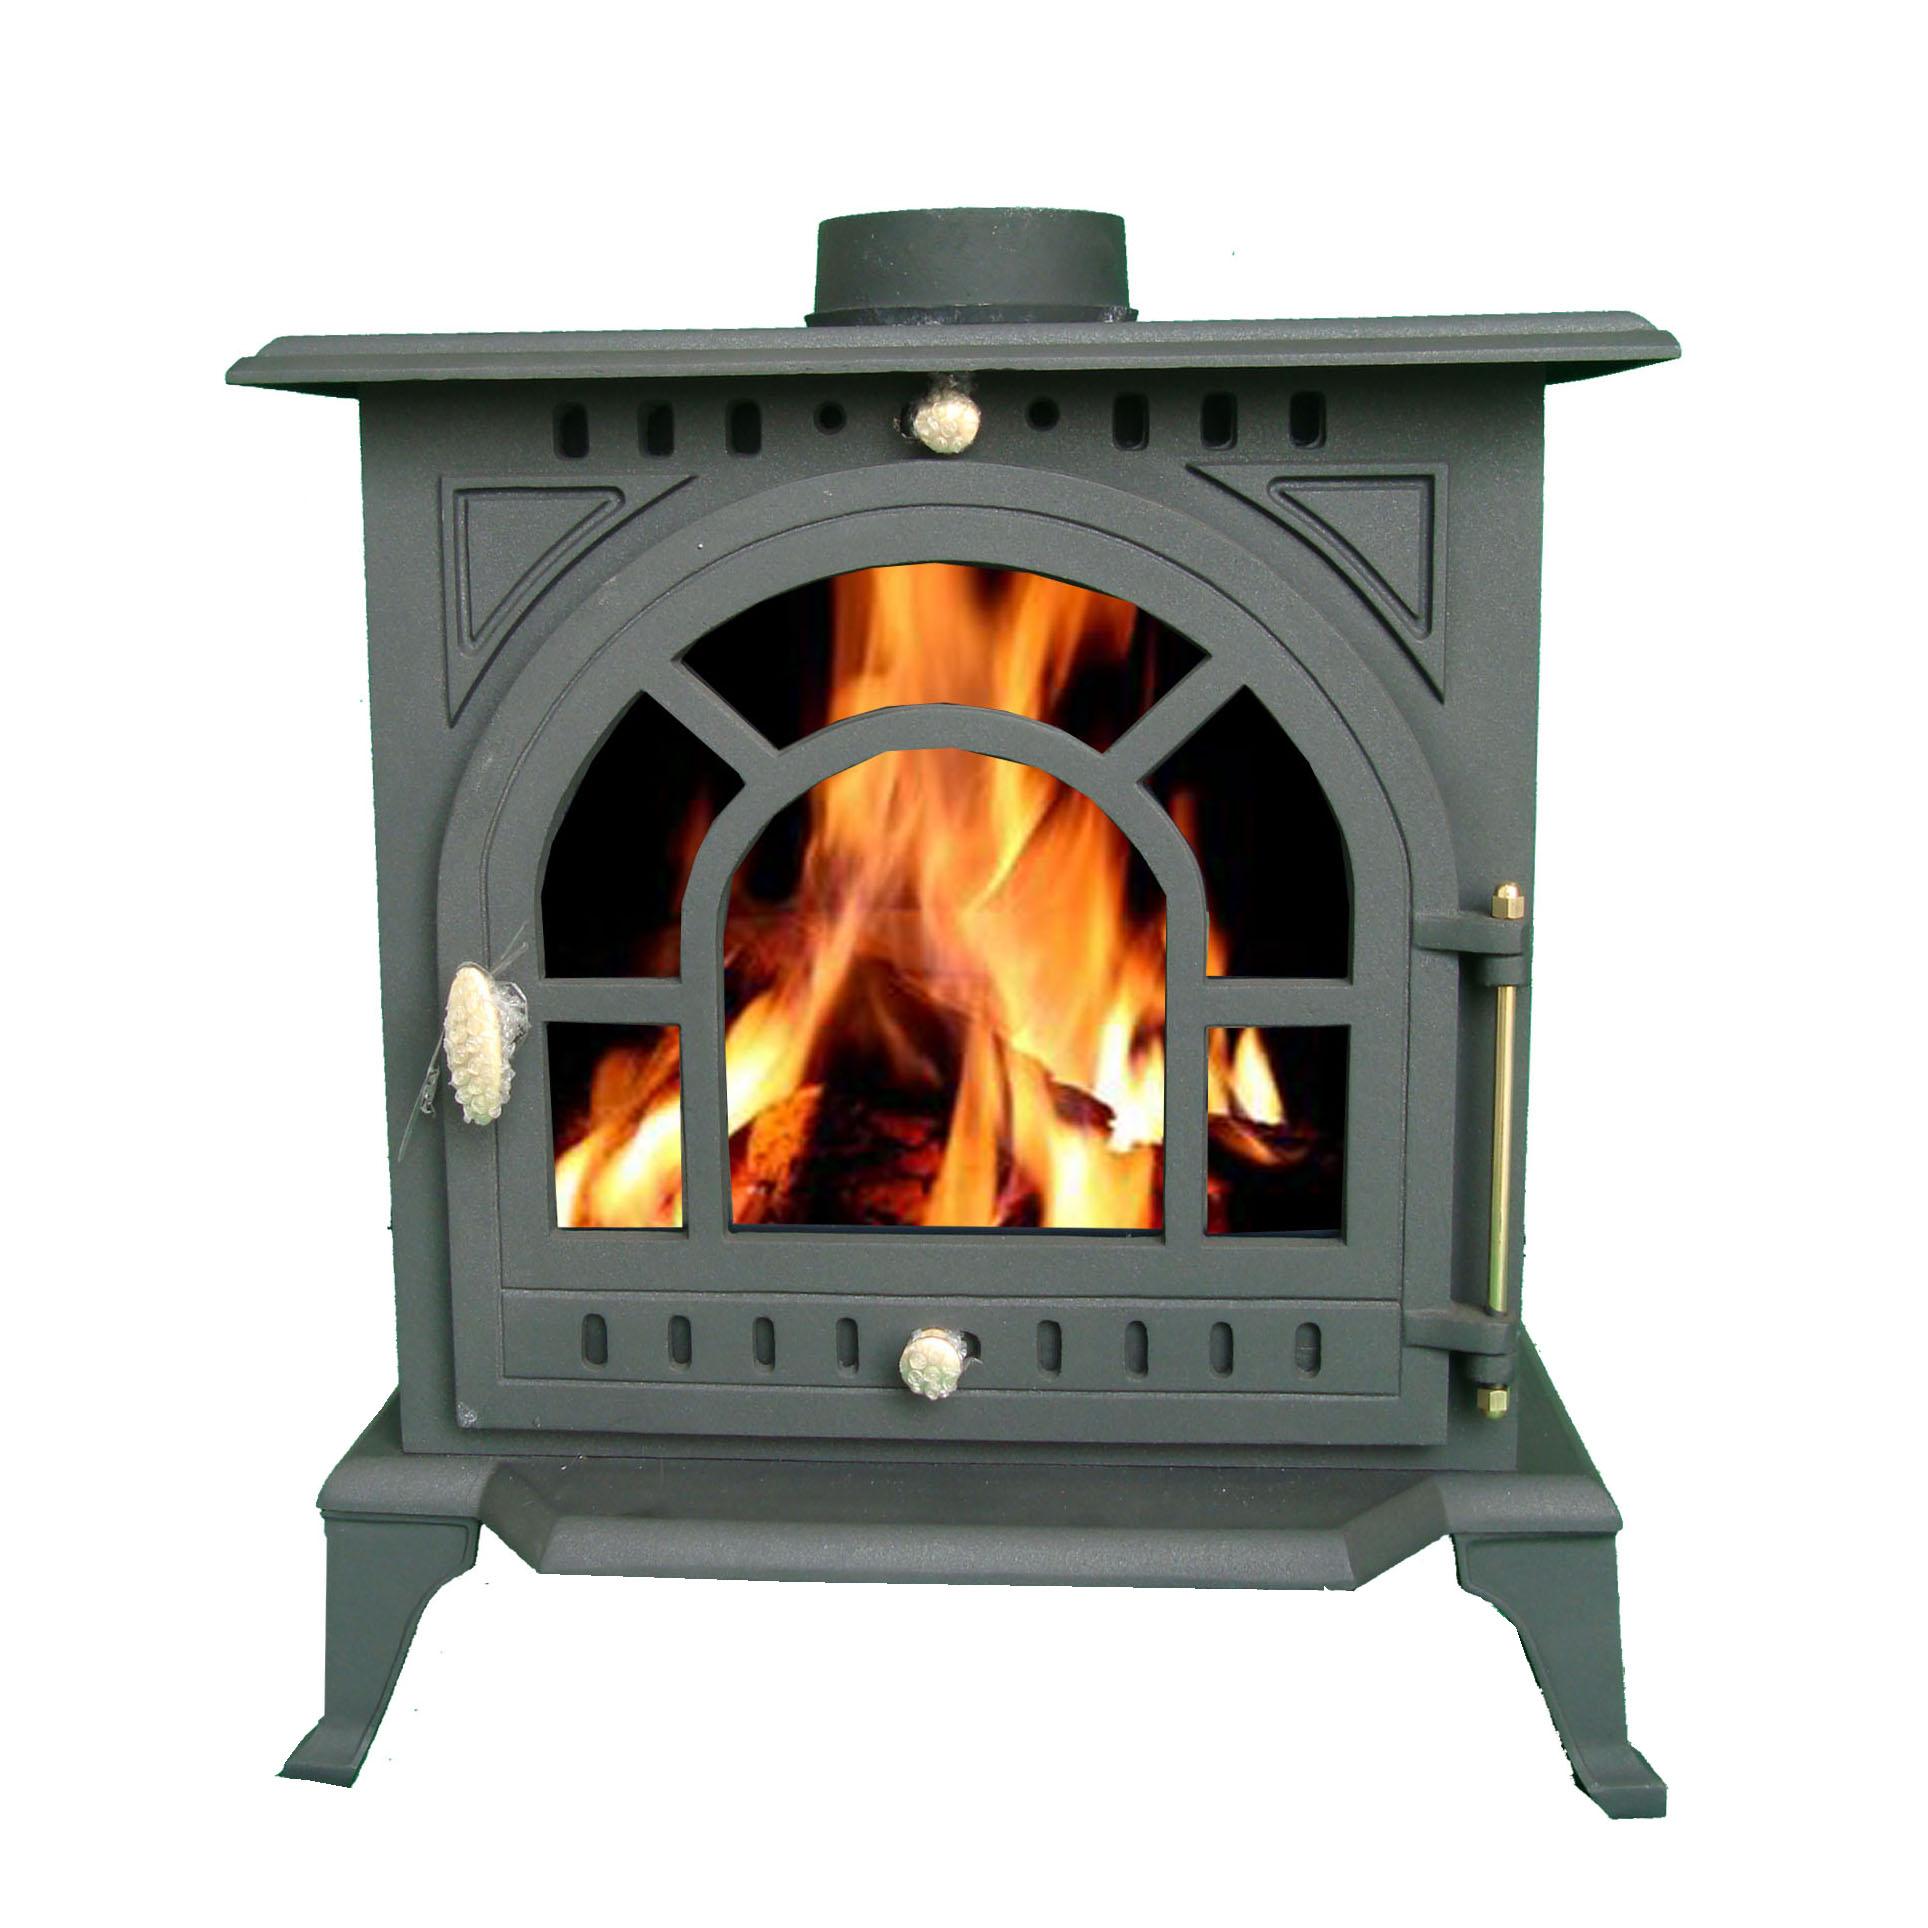 Woodburner New Cast Iron Log Burner Multifuel Wood Burning